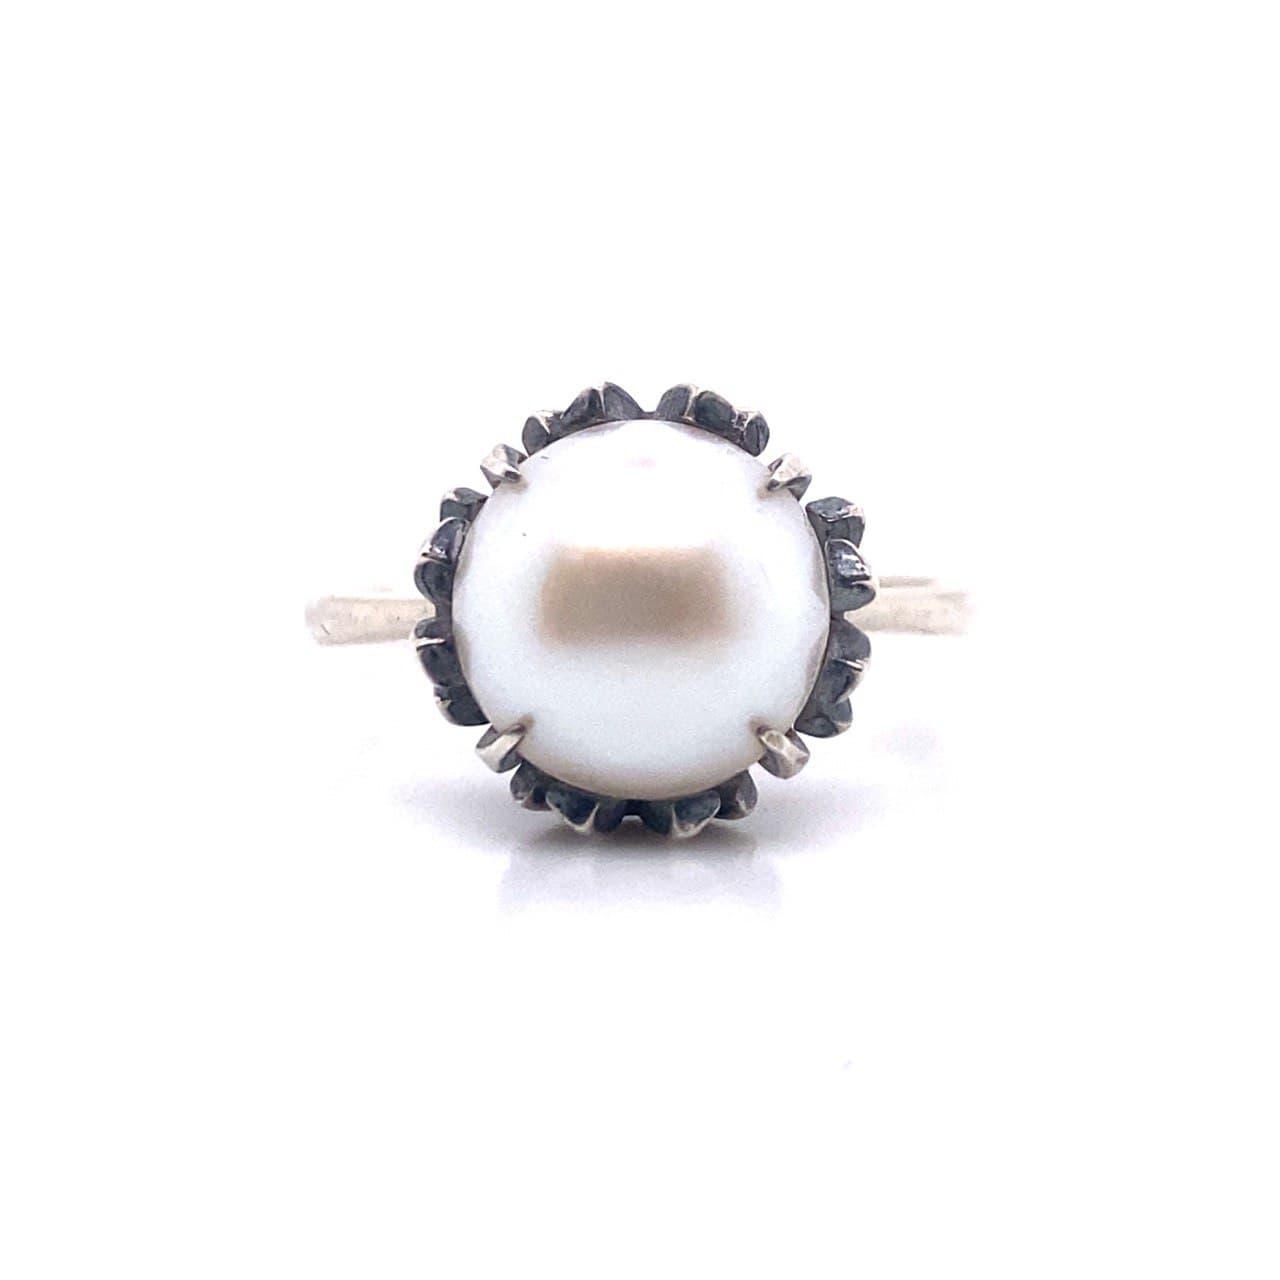 Серебряное кольцо Жемчуг арт. 2115 2115